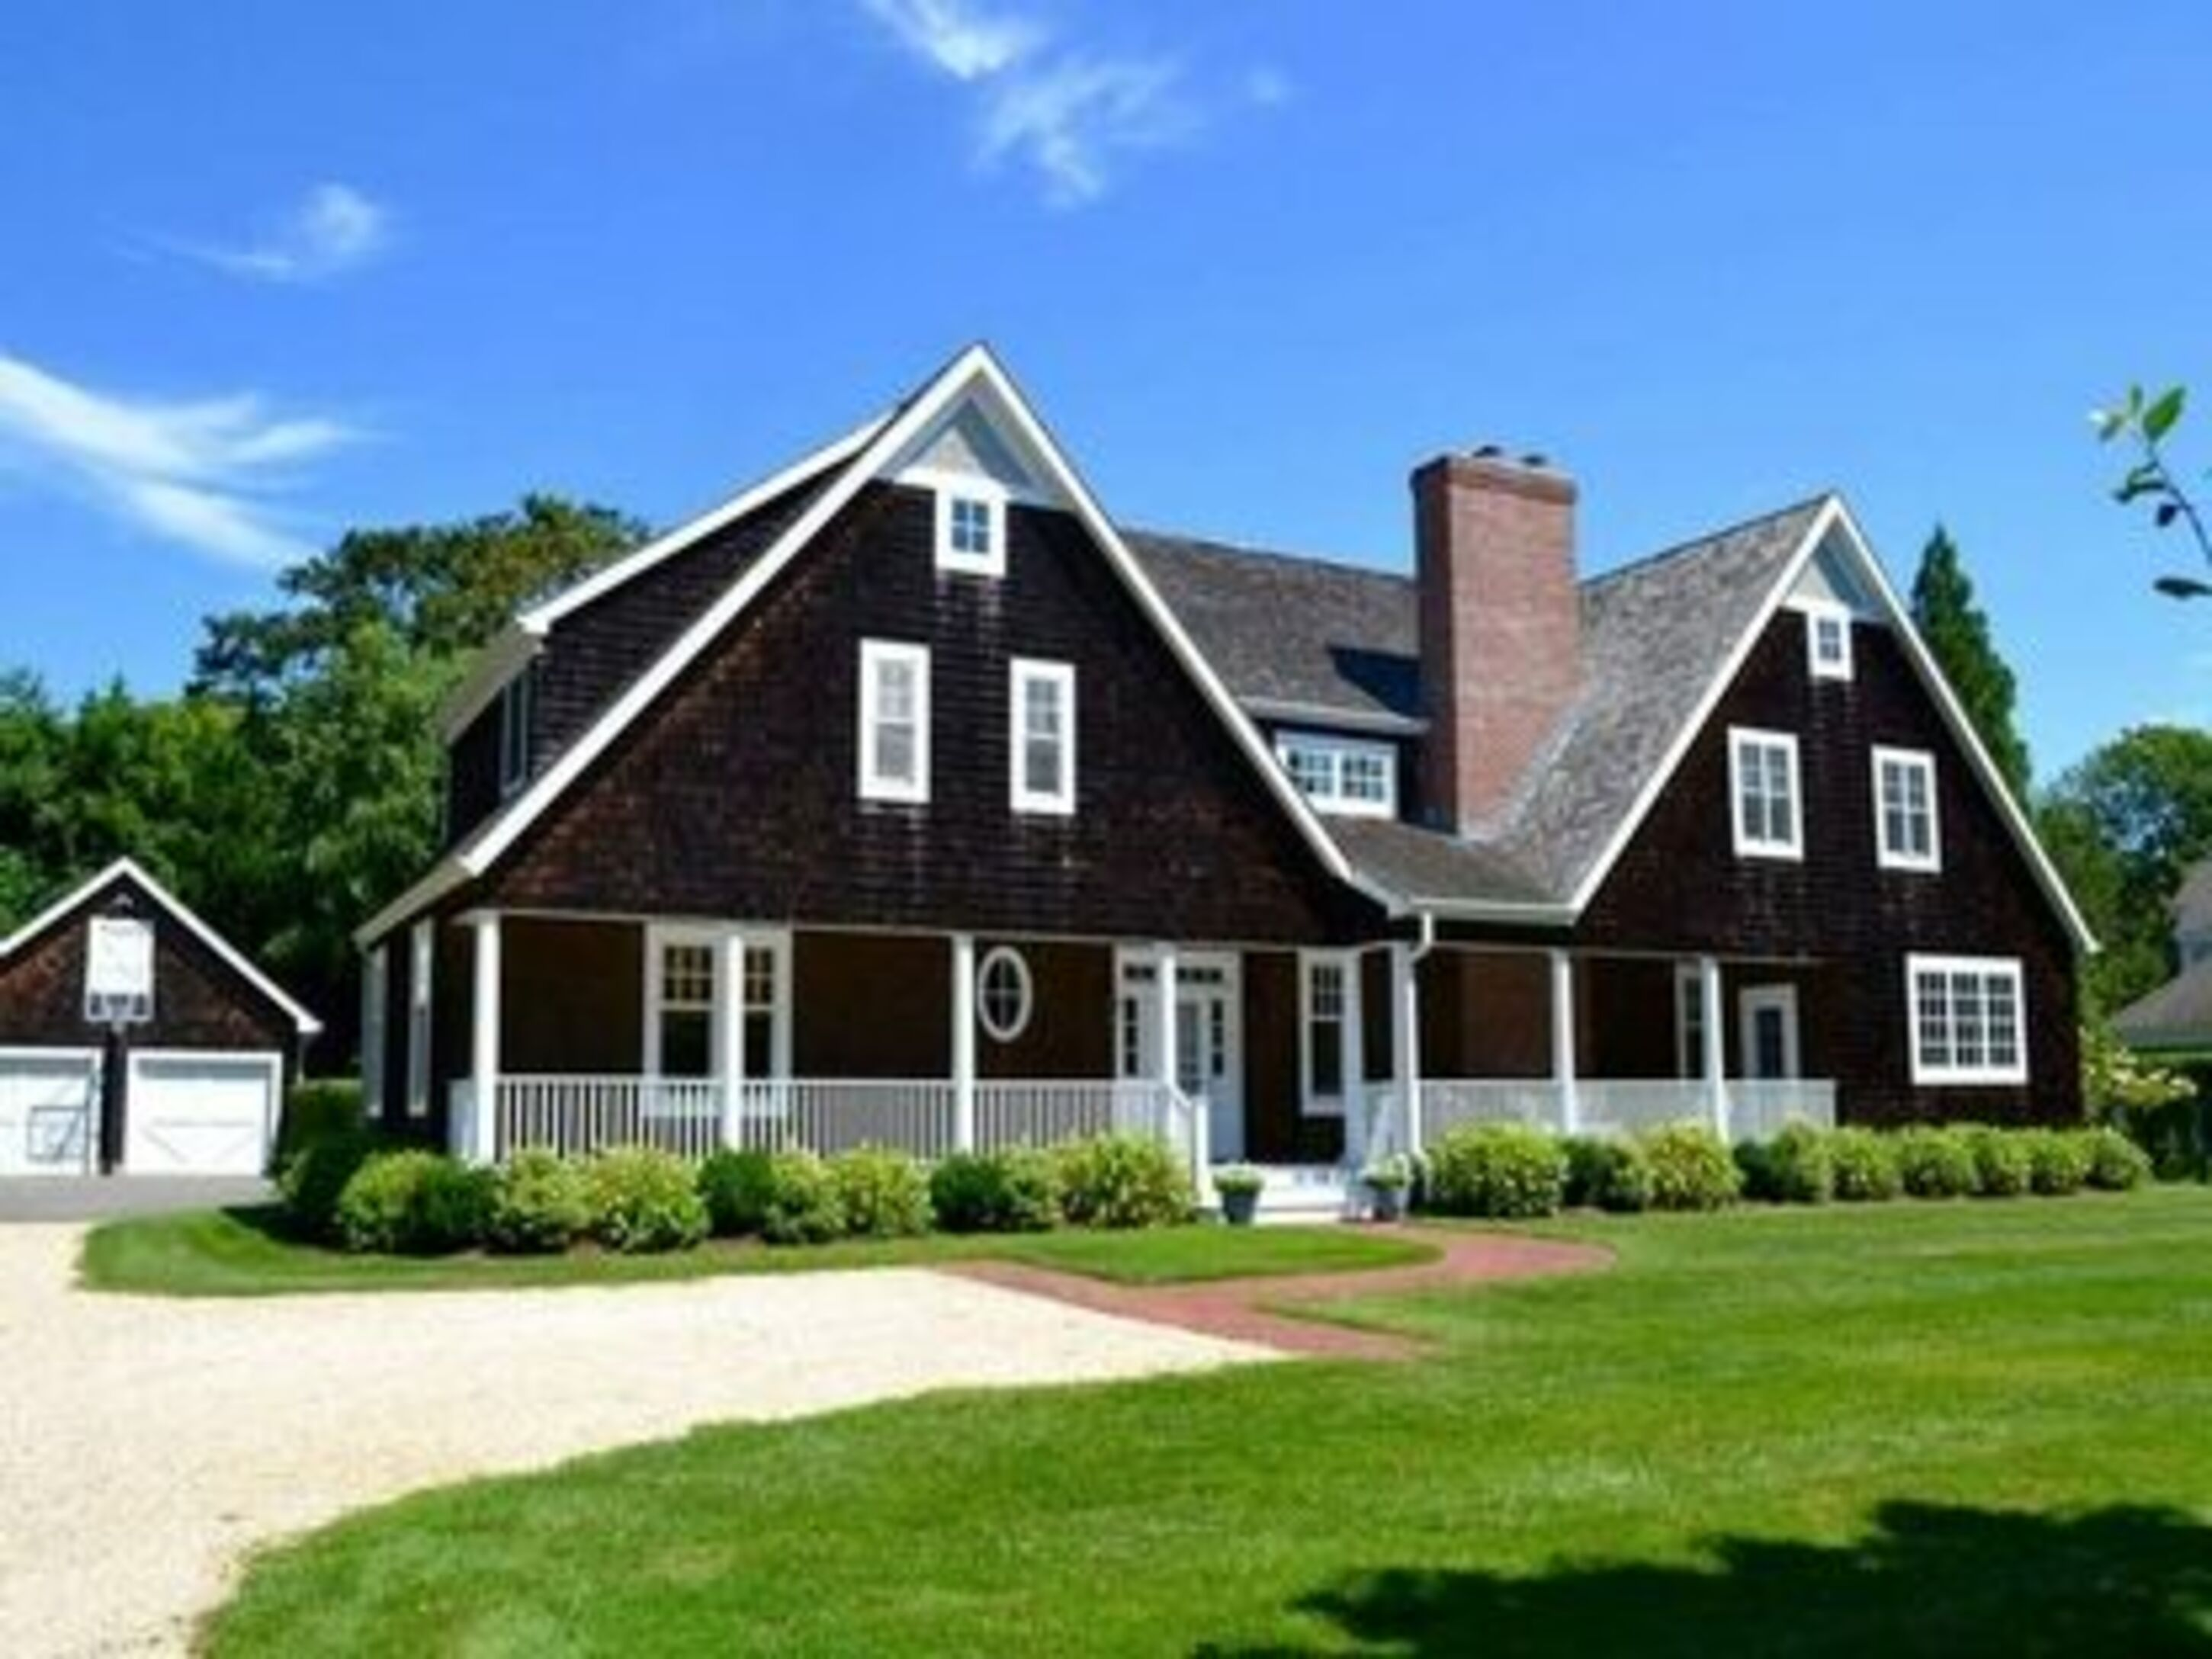 10 Borden Ln - East Hampton Village, New York